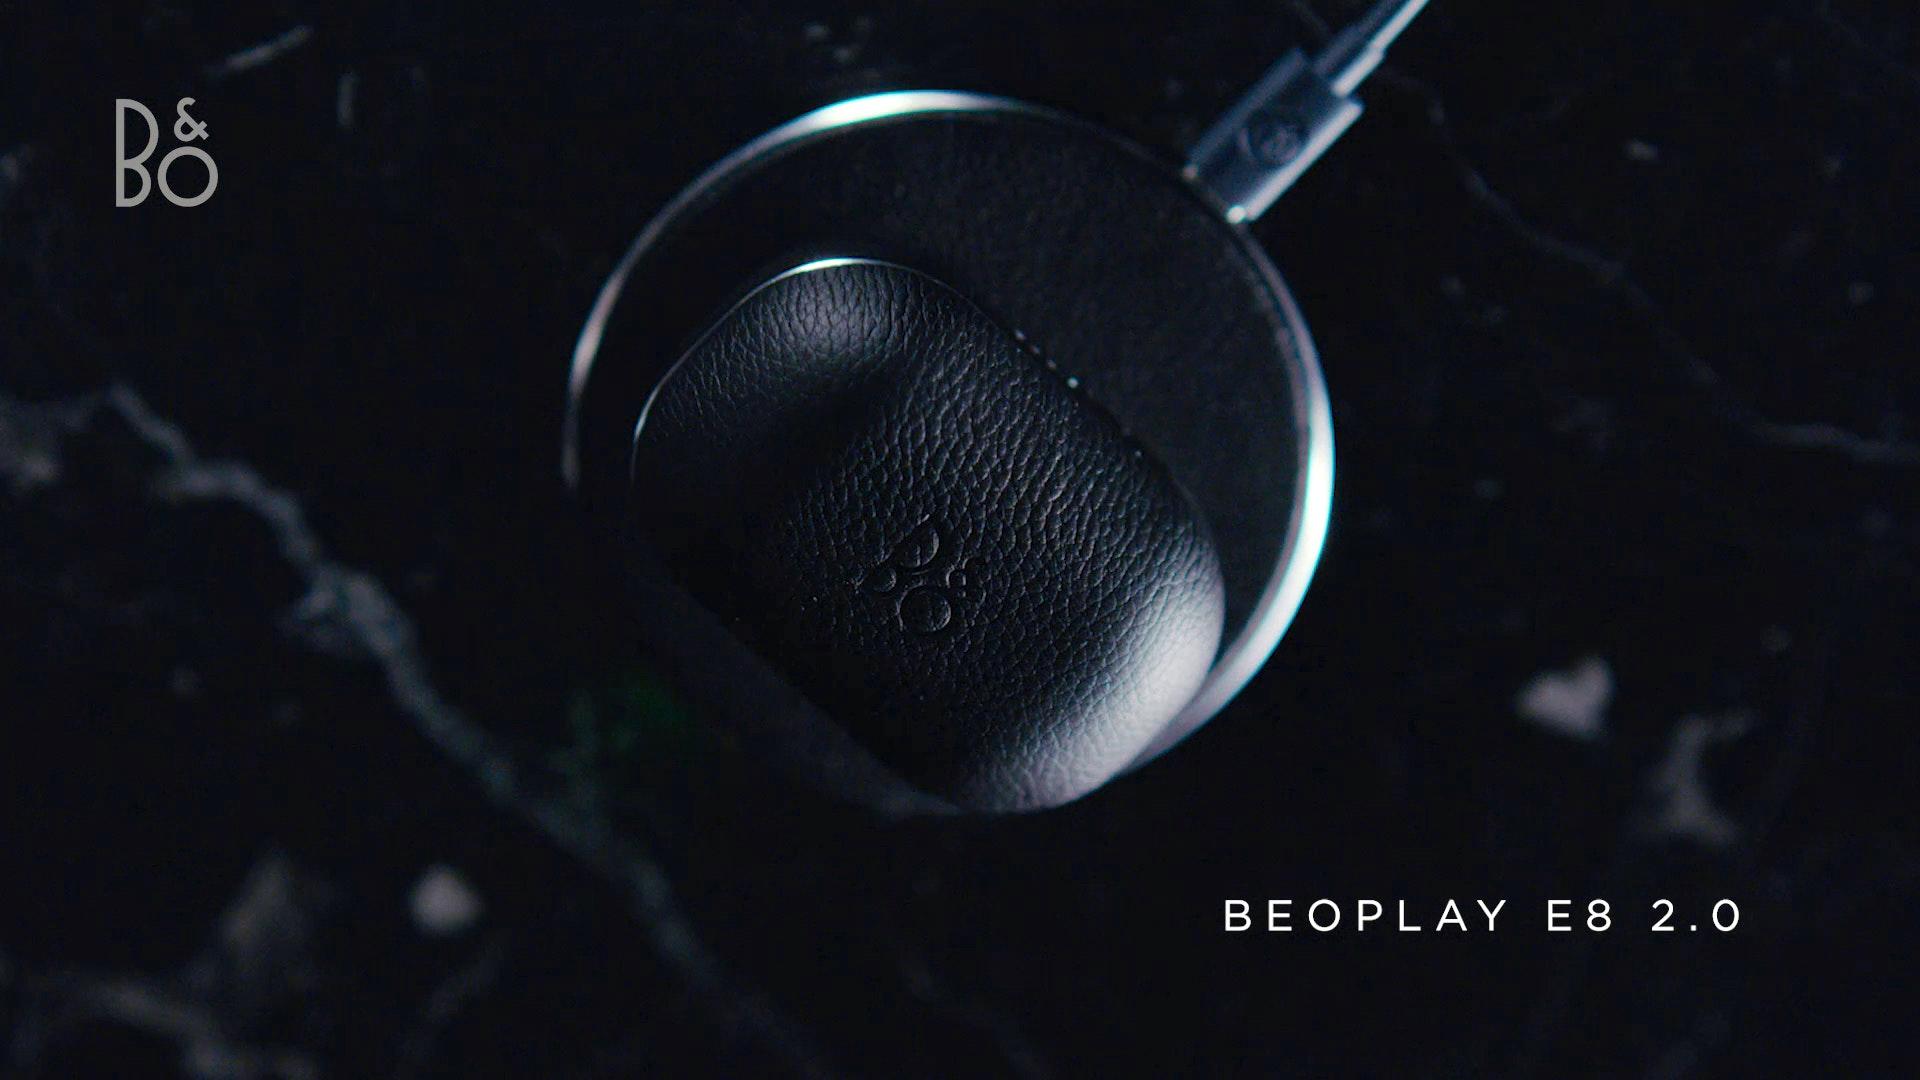 Bang & Olufsen - Beoplay E8 2.0- Image 4